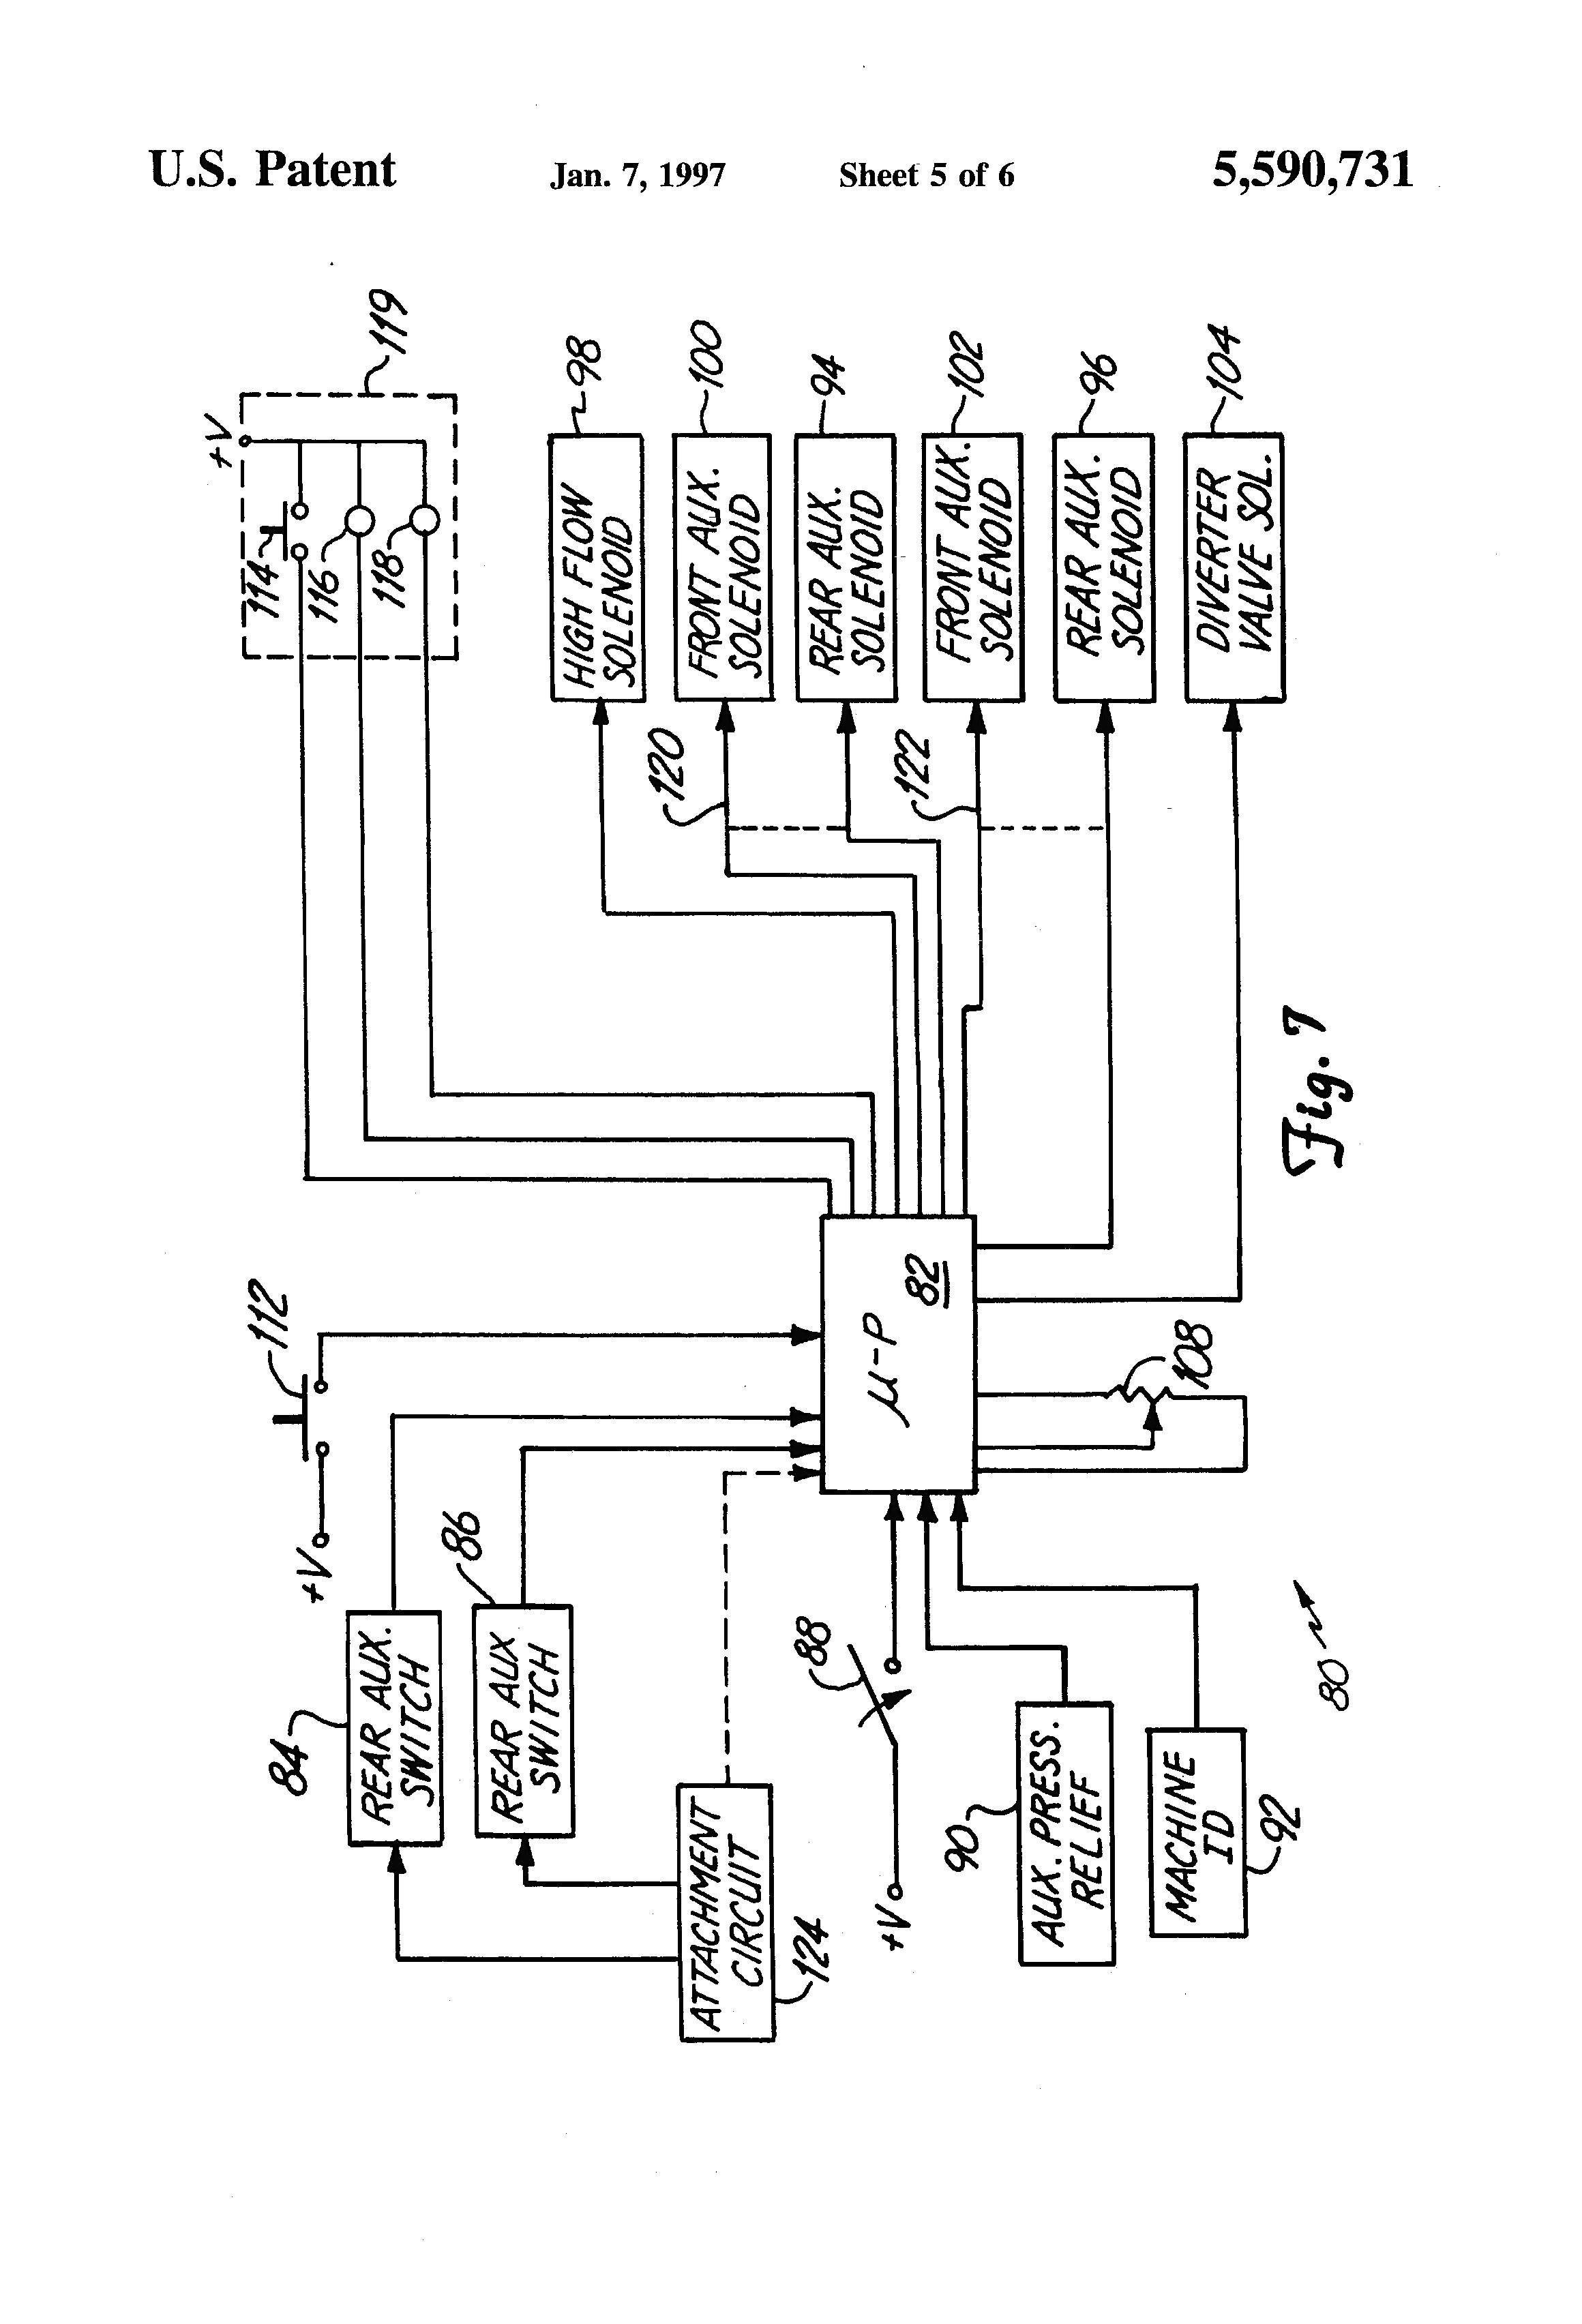 Mac Valve Wiring Diagram Inspirationa Solenoid Valve Wiring Diagram Blurts